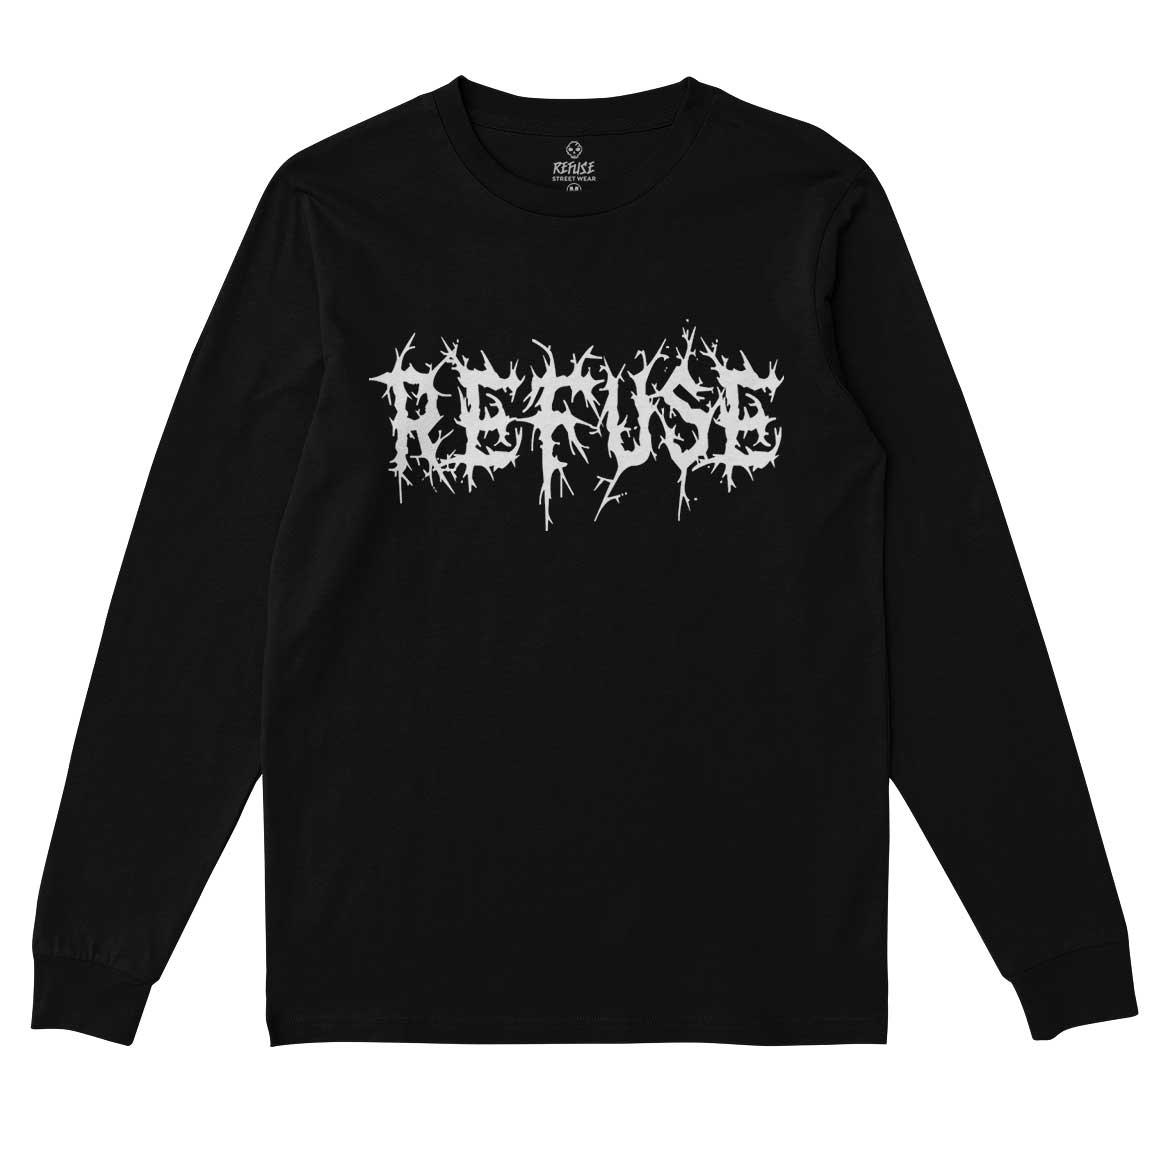 Camiseta Manga Longa Refuse Dark